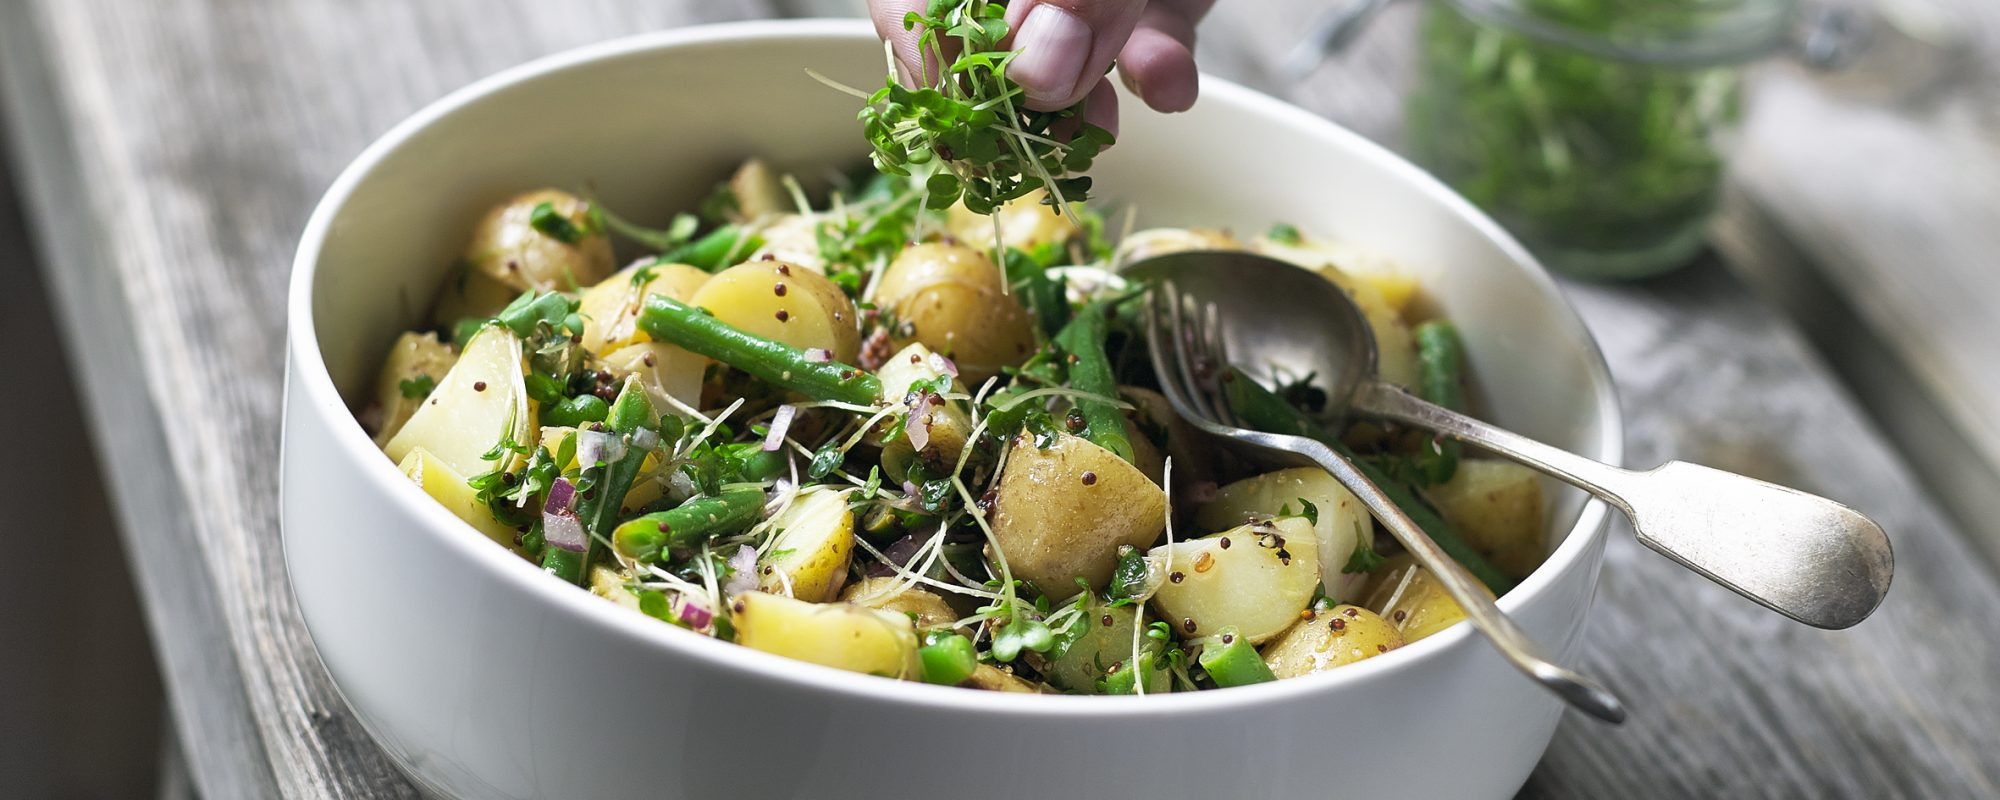 Green Beans, Salad Cress & New Potato Salad